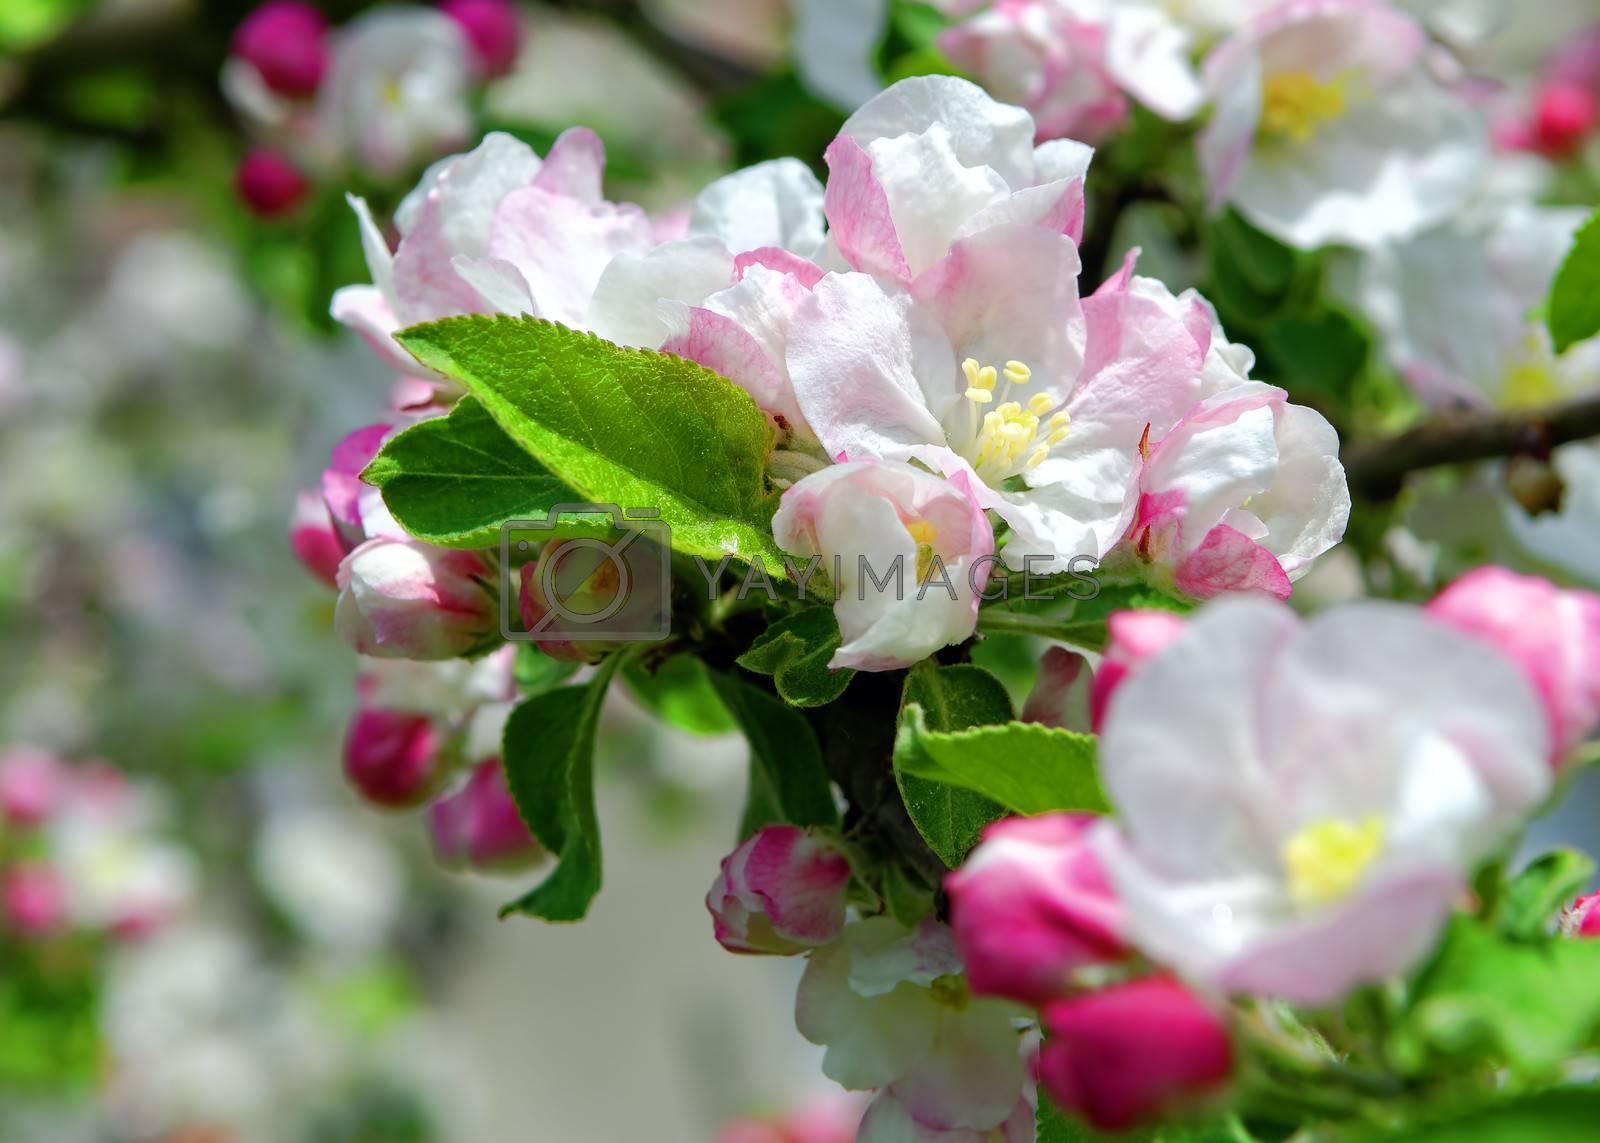 blossomed apple tree